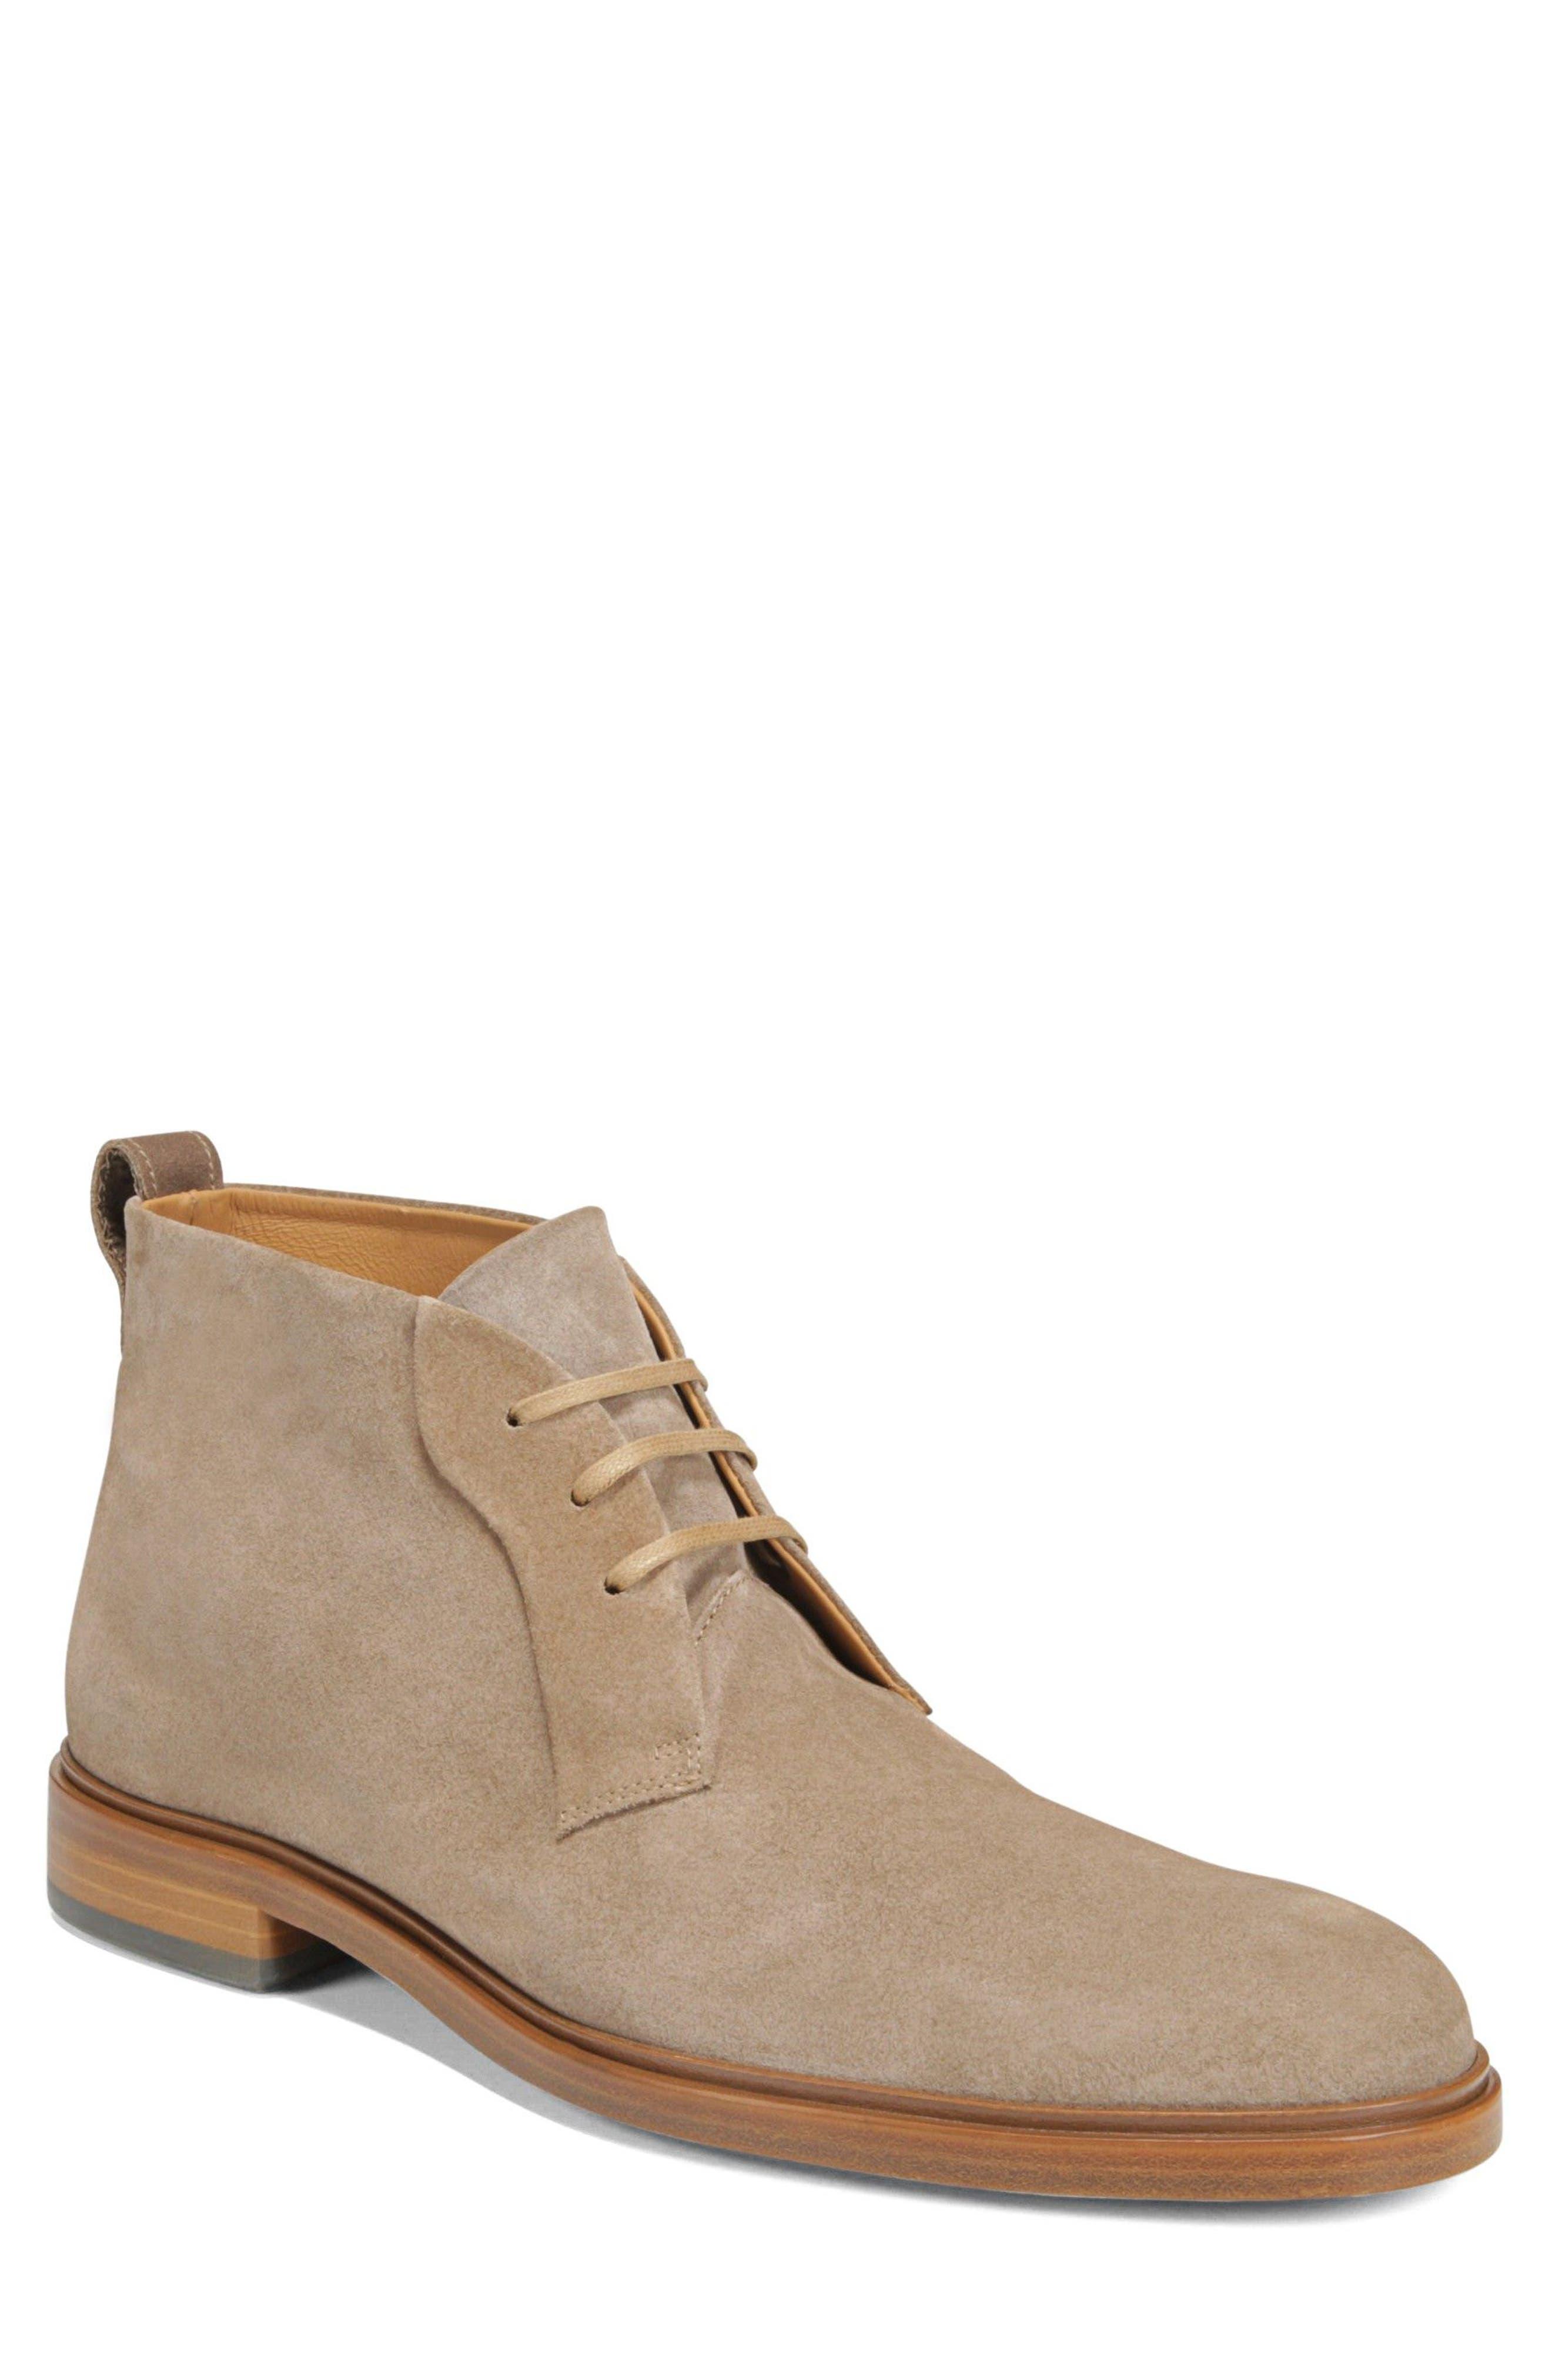 Brunswick Chukka Boot,                         Main,                         color, FLINT